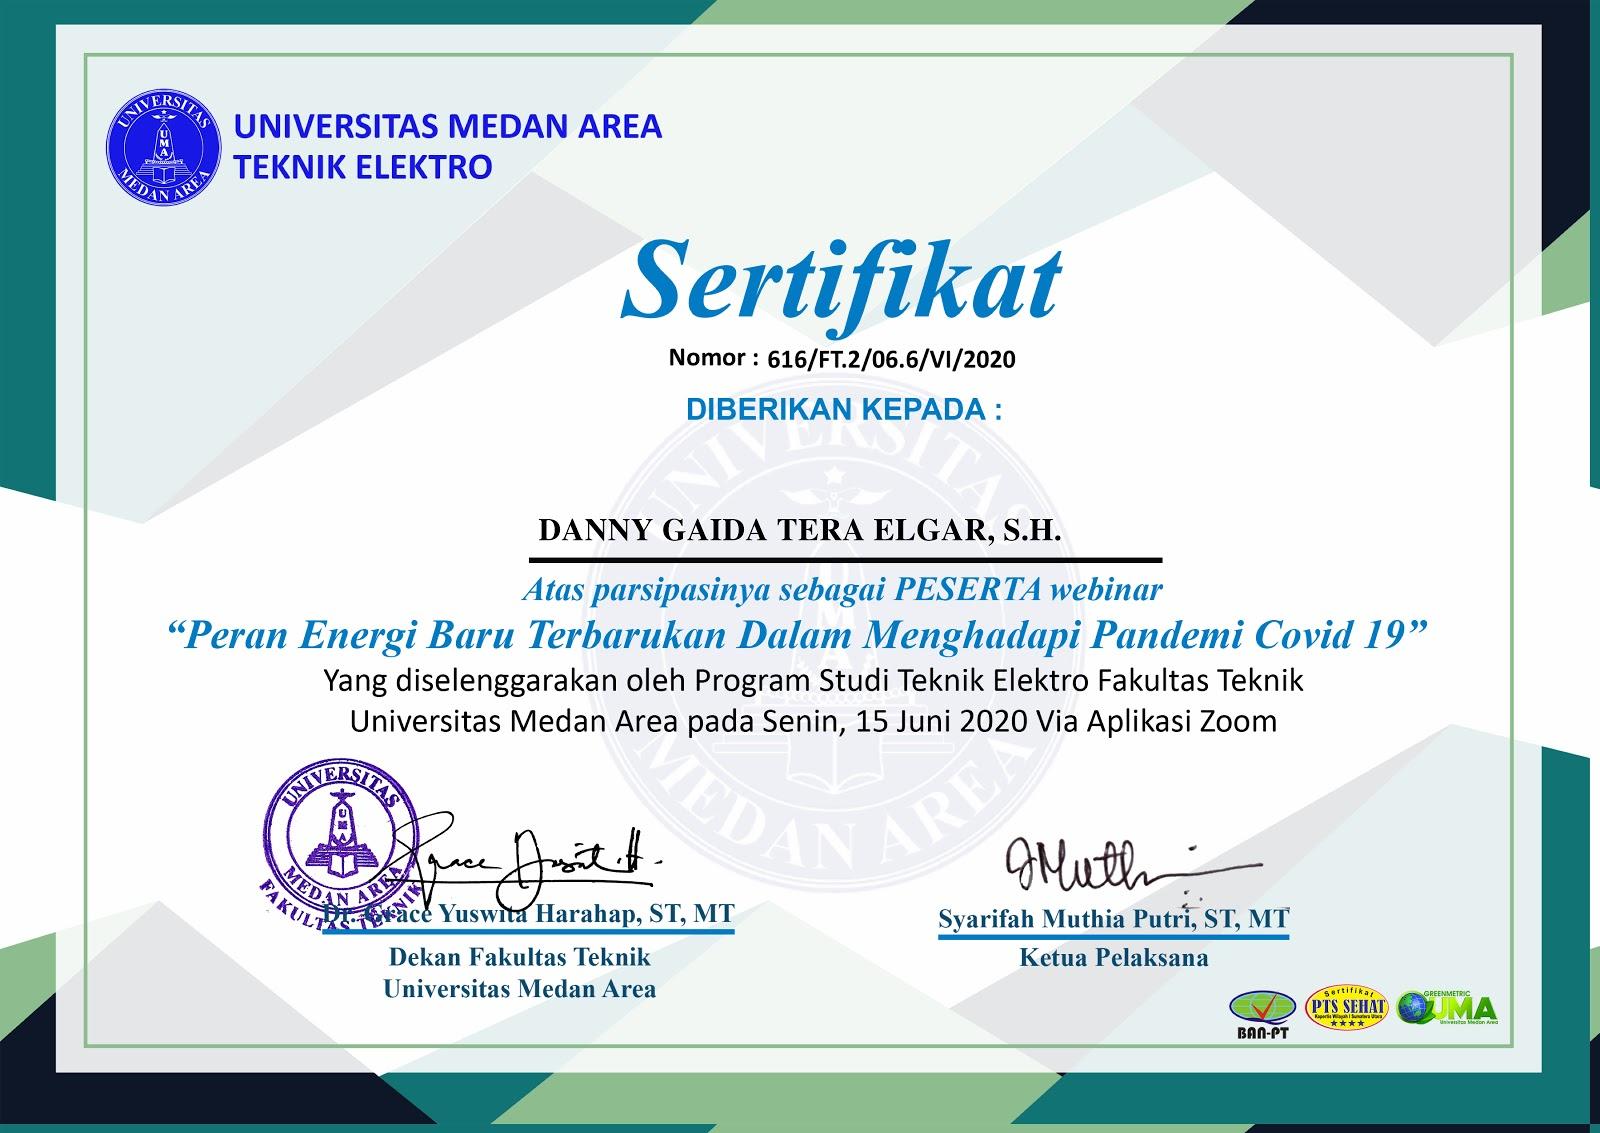 "Piagam Penghargaan Teknik Elektro Universitas Medan Area (UMA) ""Peran Energi Baru Terbarukan Dalam Menghadapi Pandemi COVID-19"" (Senin, 15 Juni 2020)"